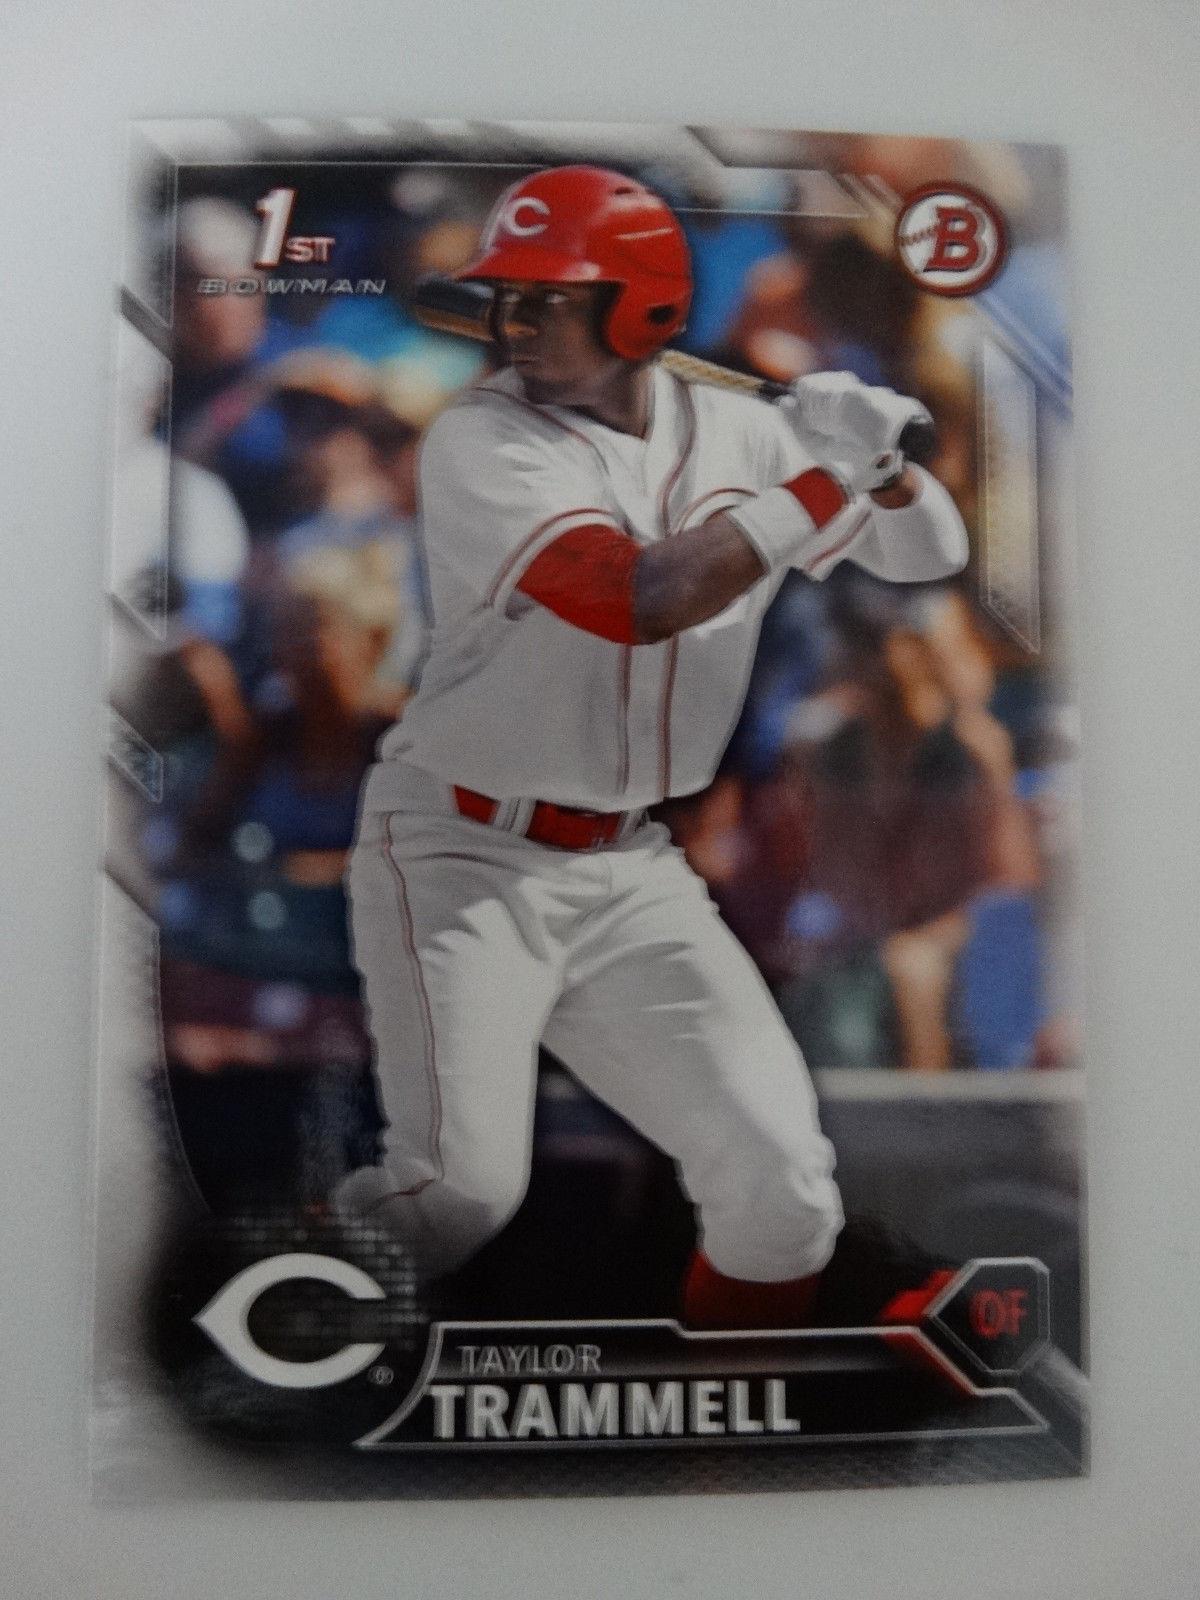 2016 Bowman Draft #BD-13 Taylor Trammell Cincinnati Reds Rookie RC Baseball Card